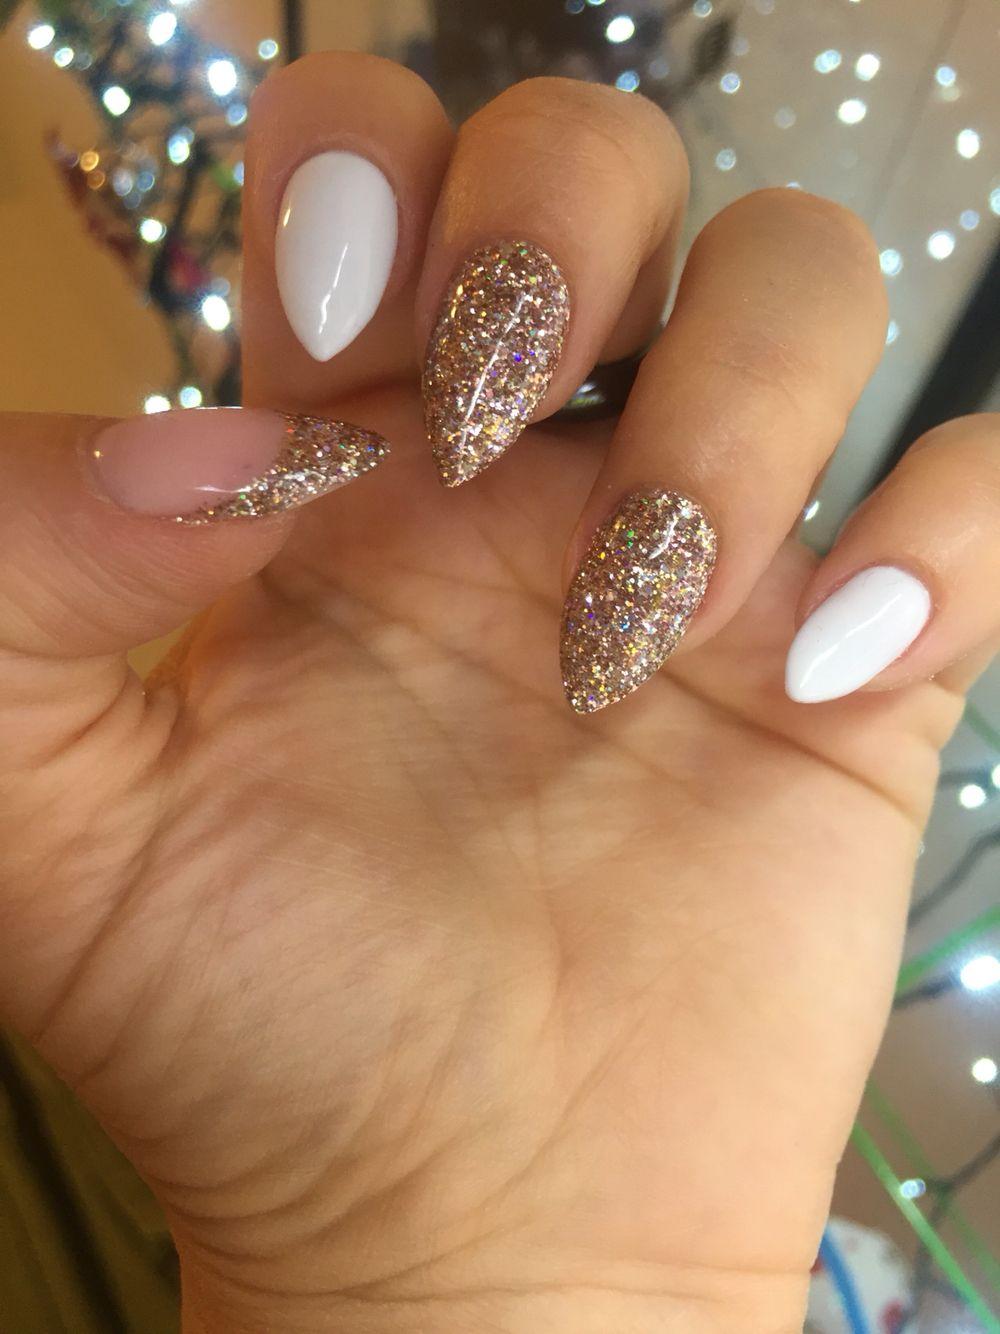 Bio Sculpture Gel Stiletto Glitter Nails Gelove Nehty Design Nehtu Nehty